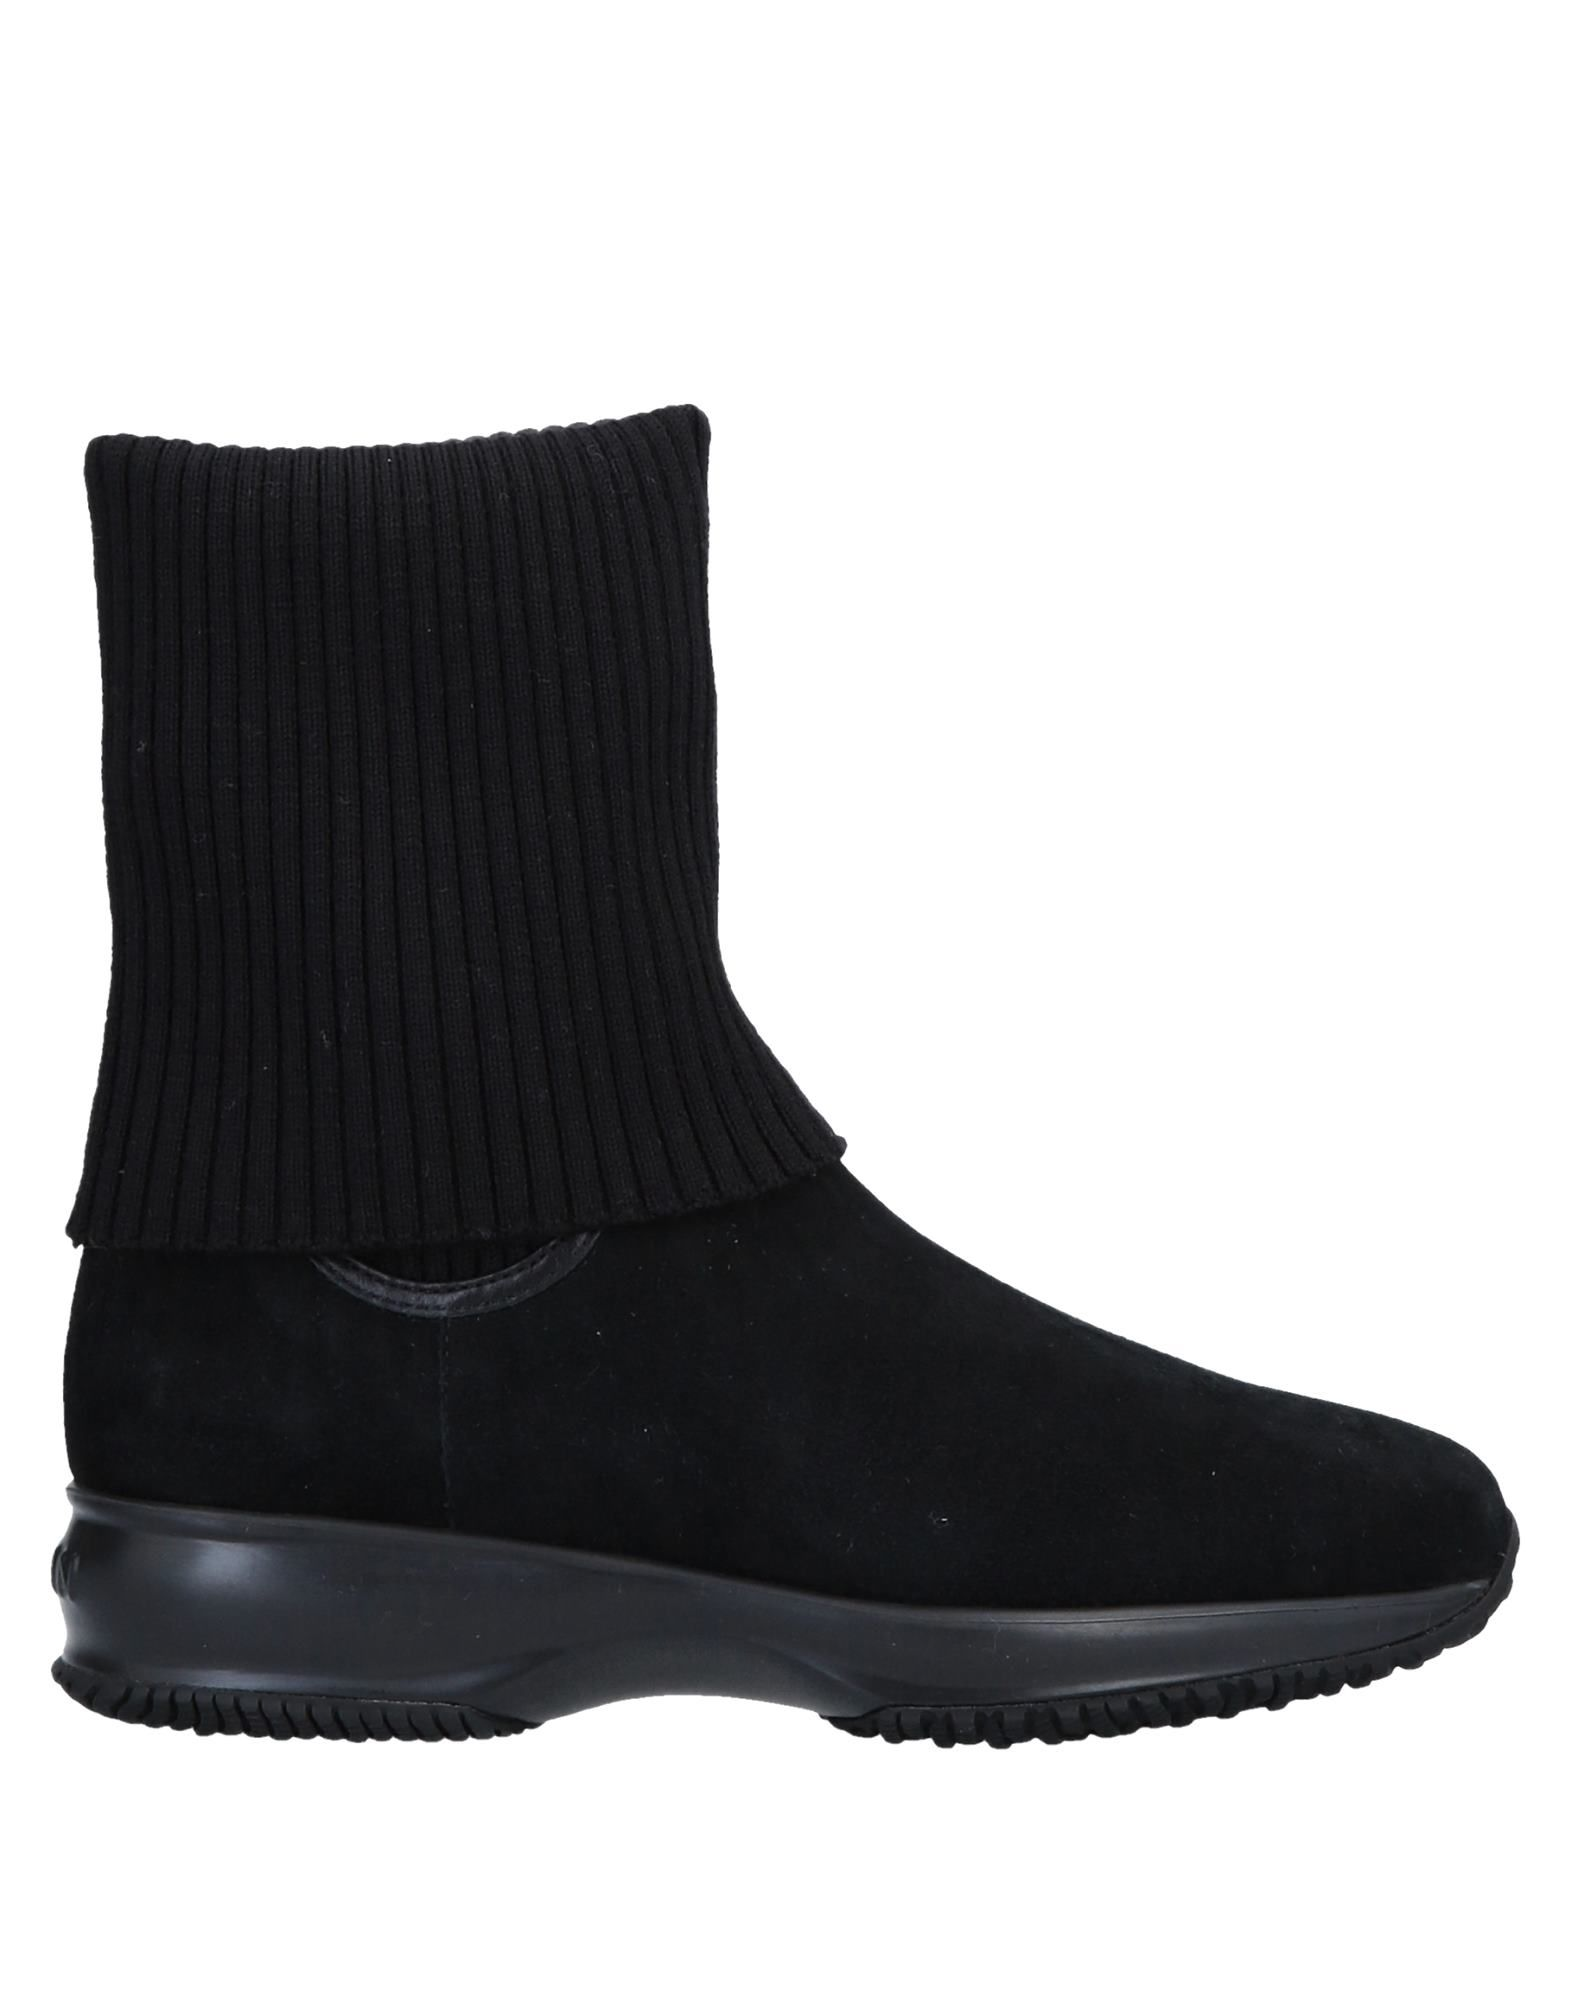 Bottine Hogan Femme - Bottines Hogan Noir Chaussures femme pas cher homme et femme